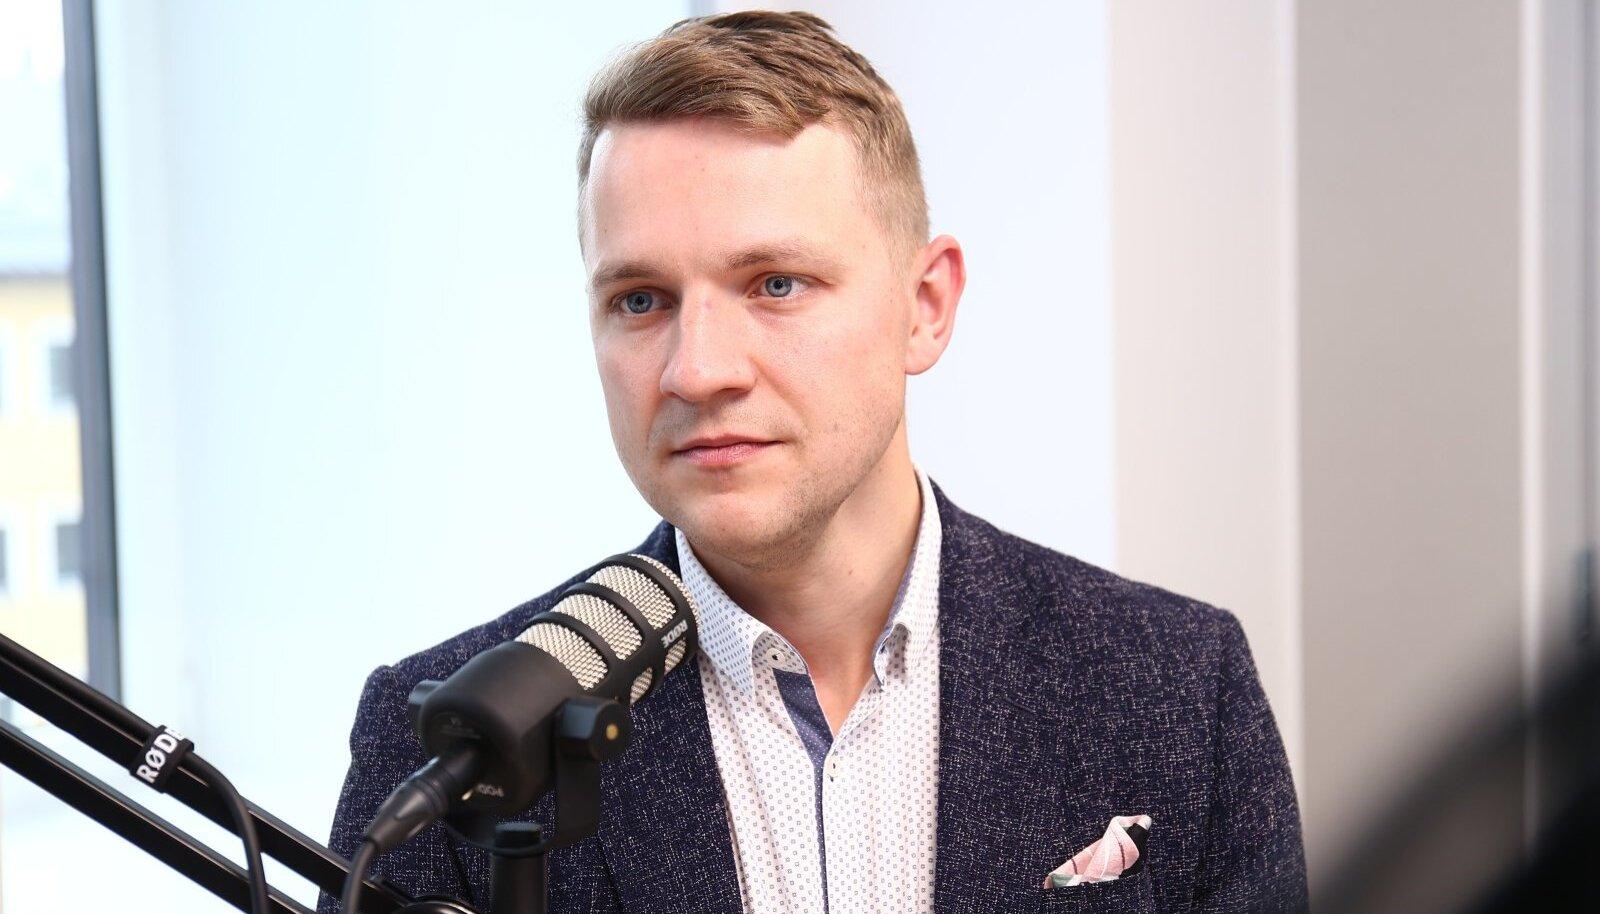 Henrik Välja